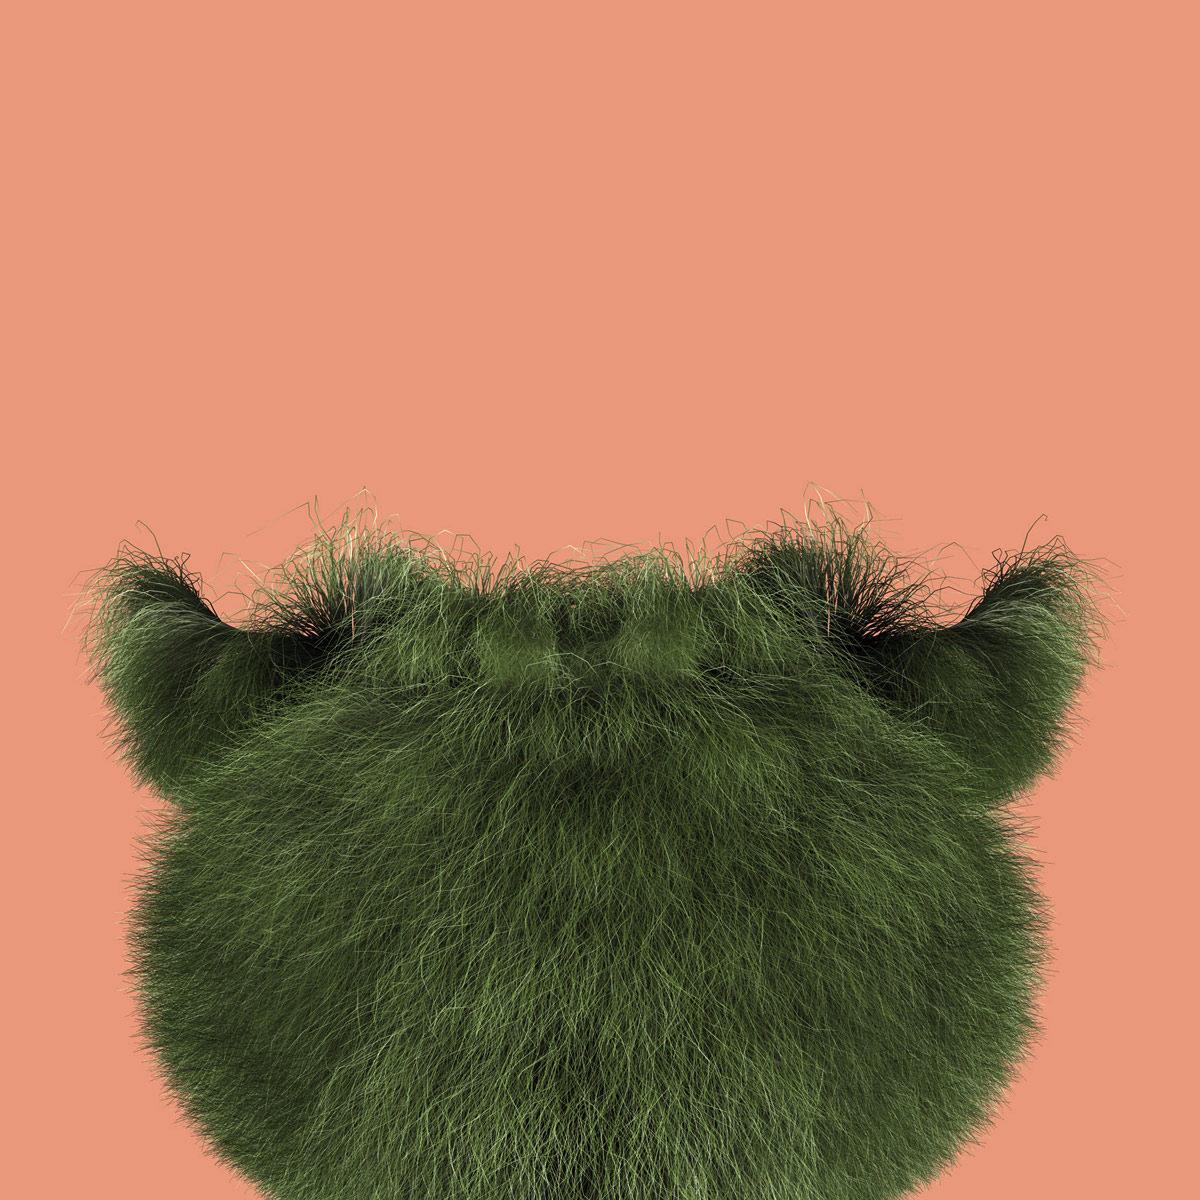 Grassbug 8, 2008, C-Print, 100 x 100 cm